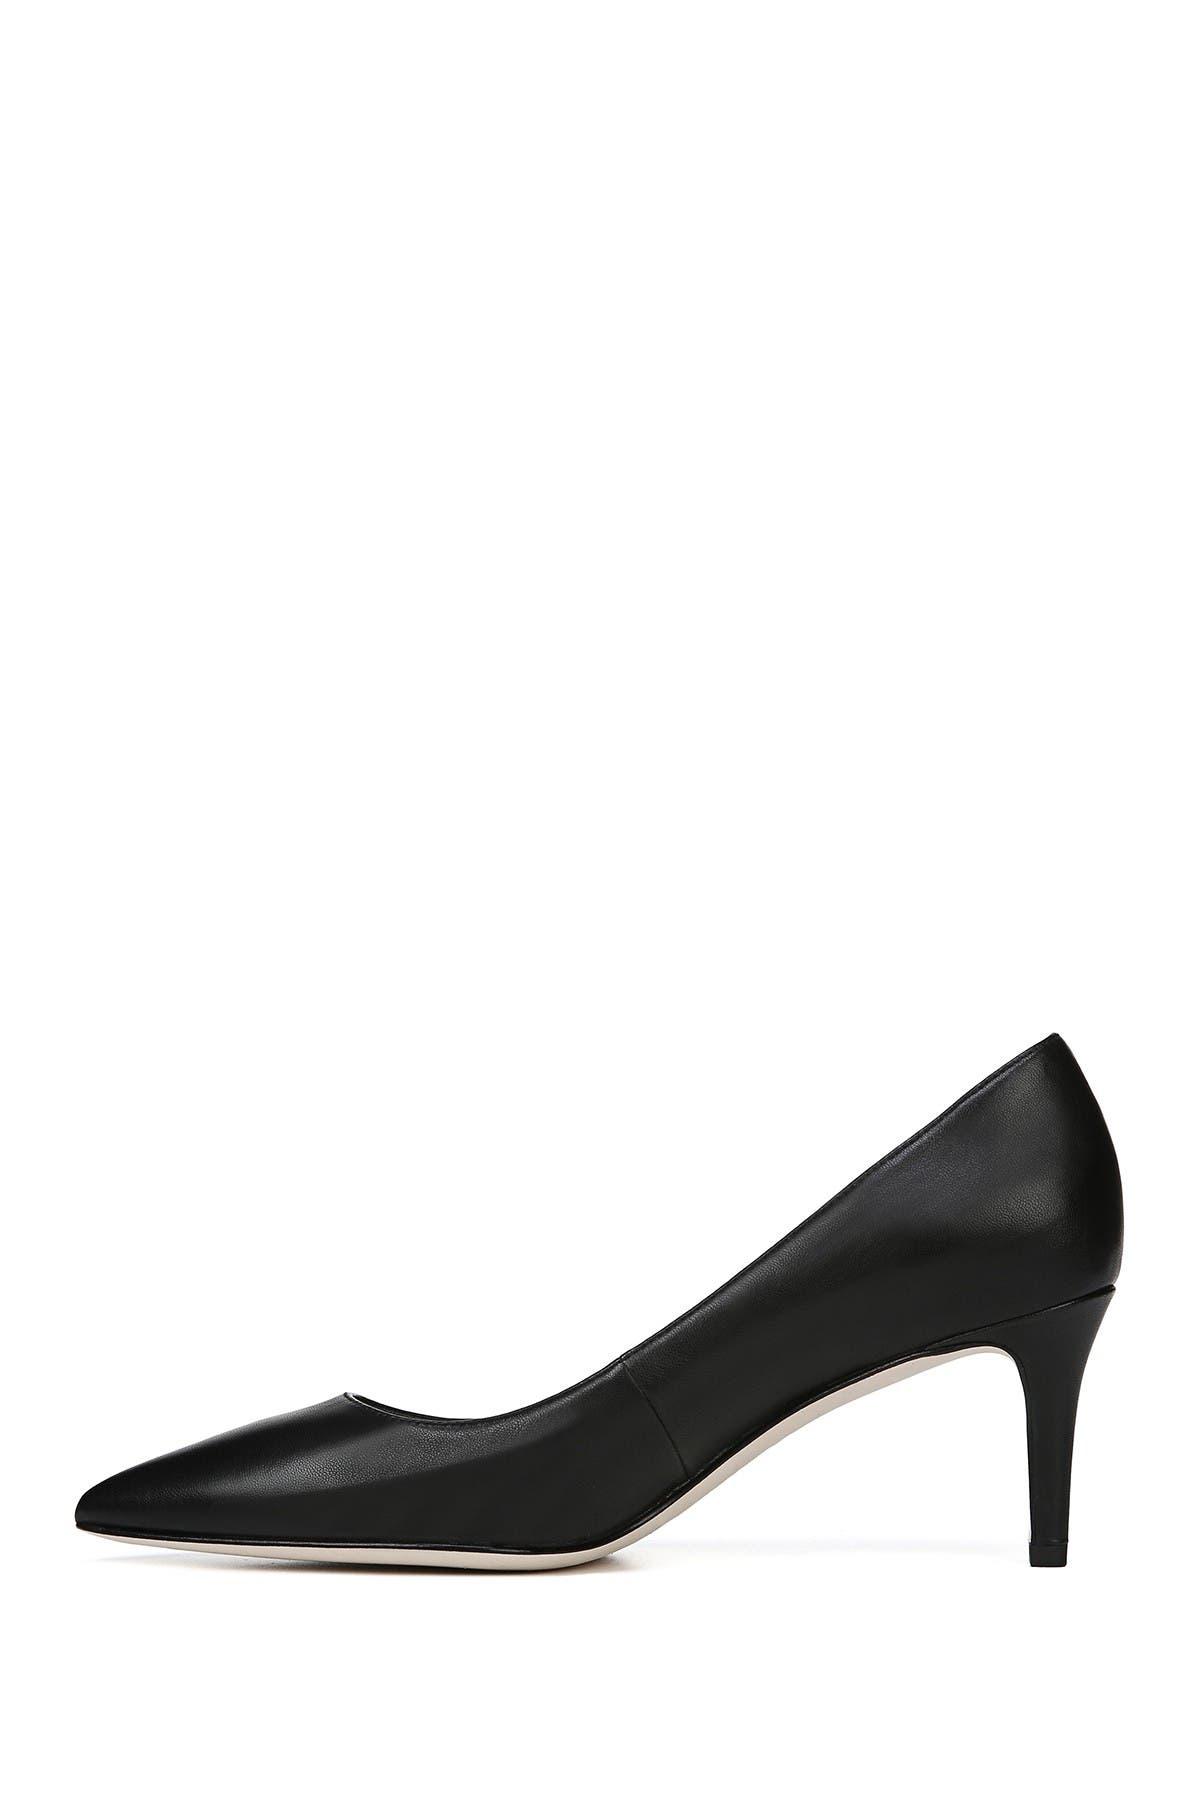 Via Spiga | Gya Pointed Toe Leather